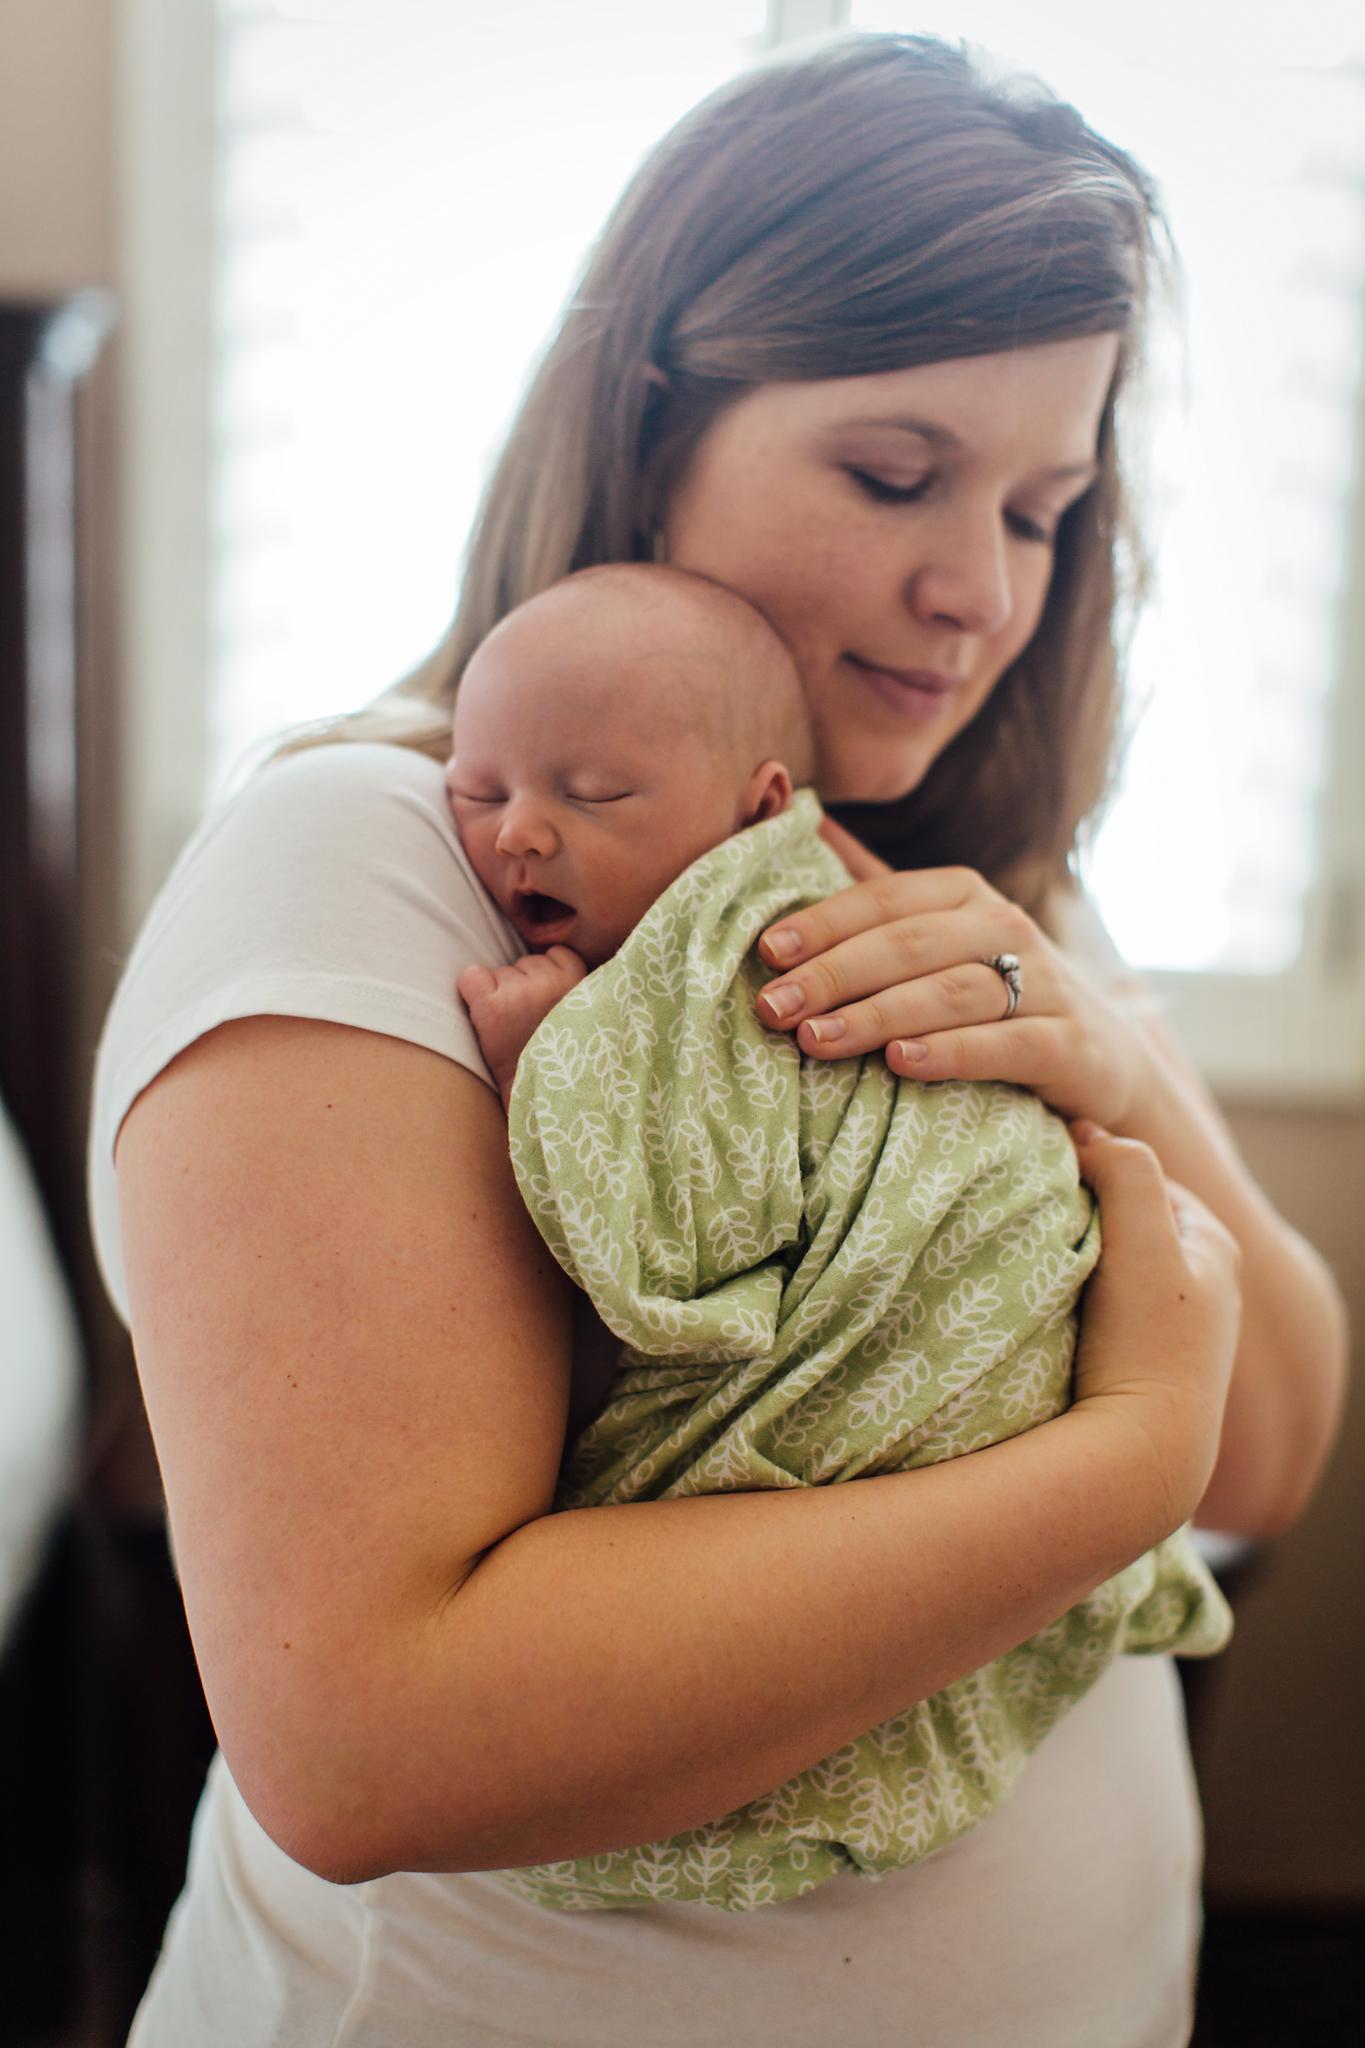 el-paso-newborn-photography-1.jpg